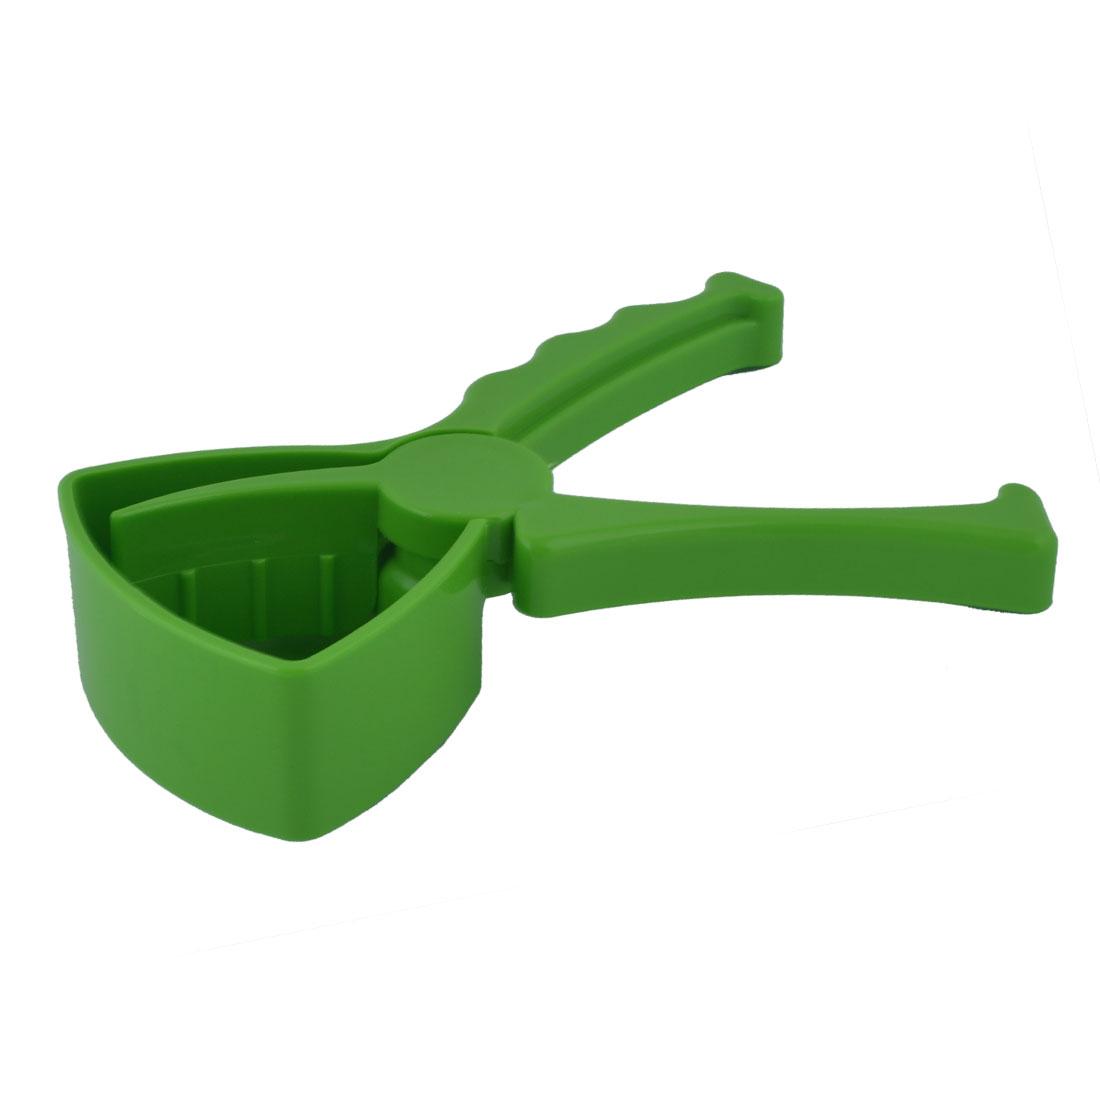 Home Kitchen Plastic Lemon Citrus Press Handy Grips Blender Juicer Green